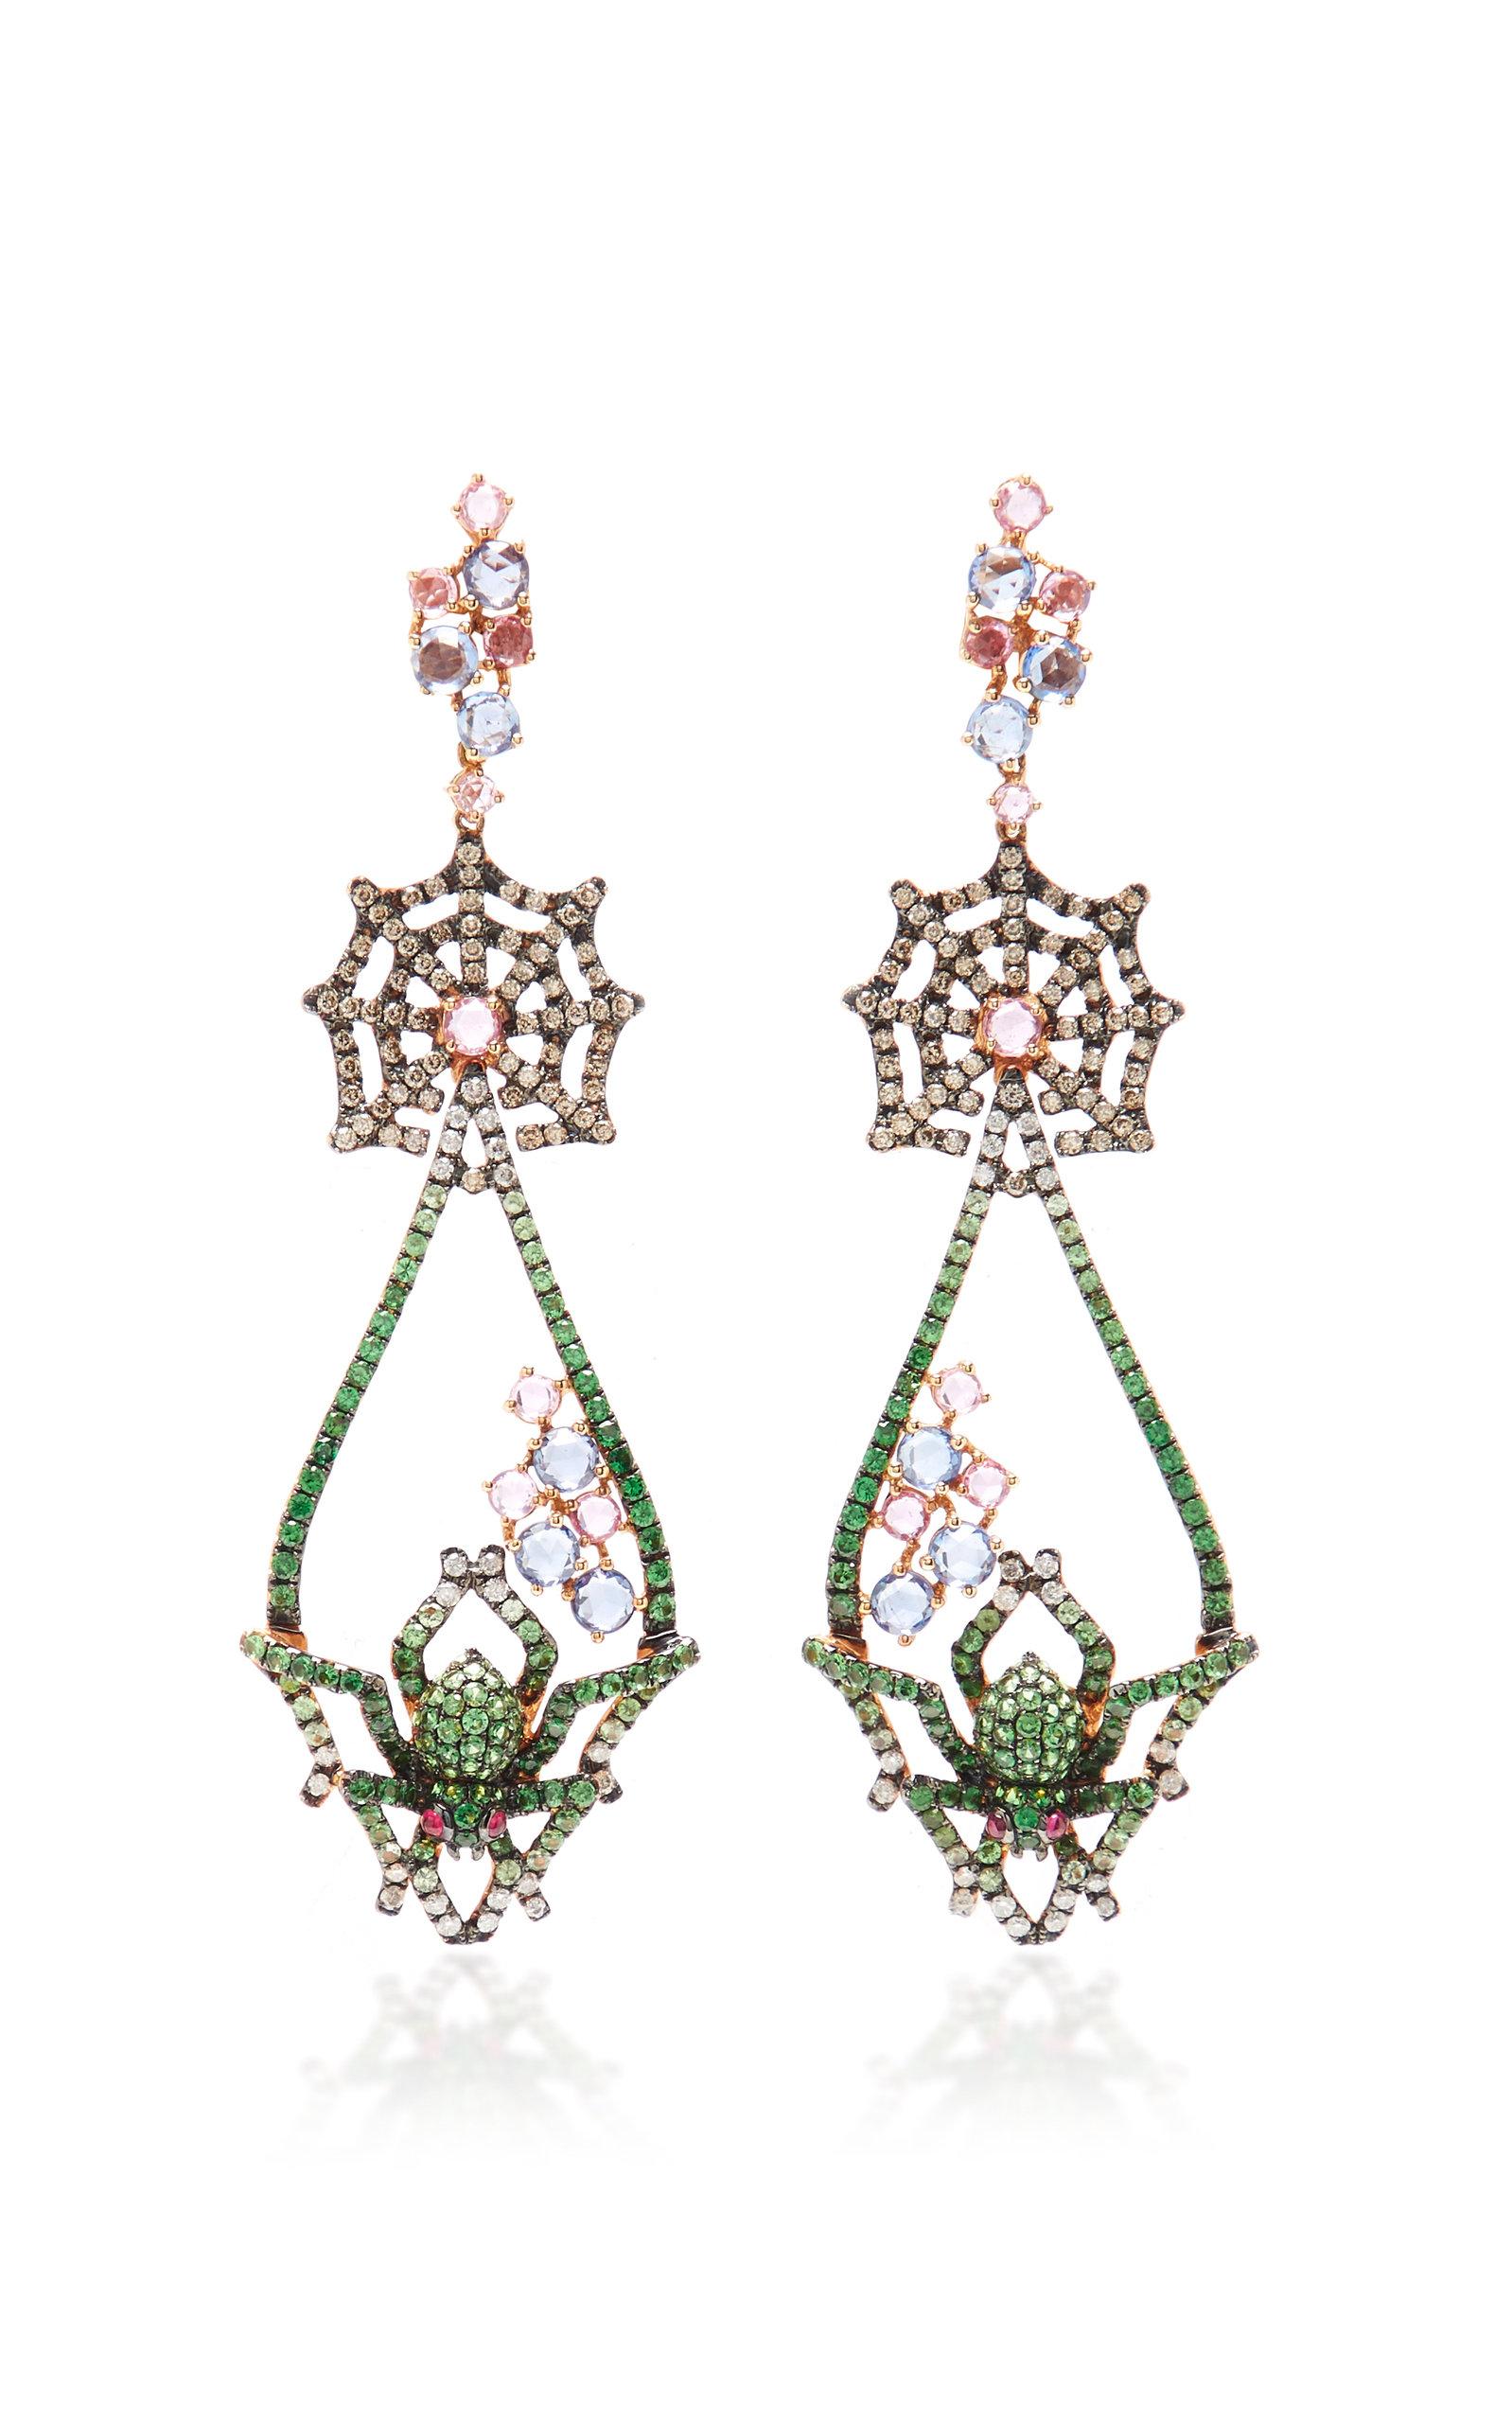 674d4f98f 18K Rose Gold, Tsavorite, Sapphire, Diamond And Ruby Earrings by ...